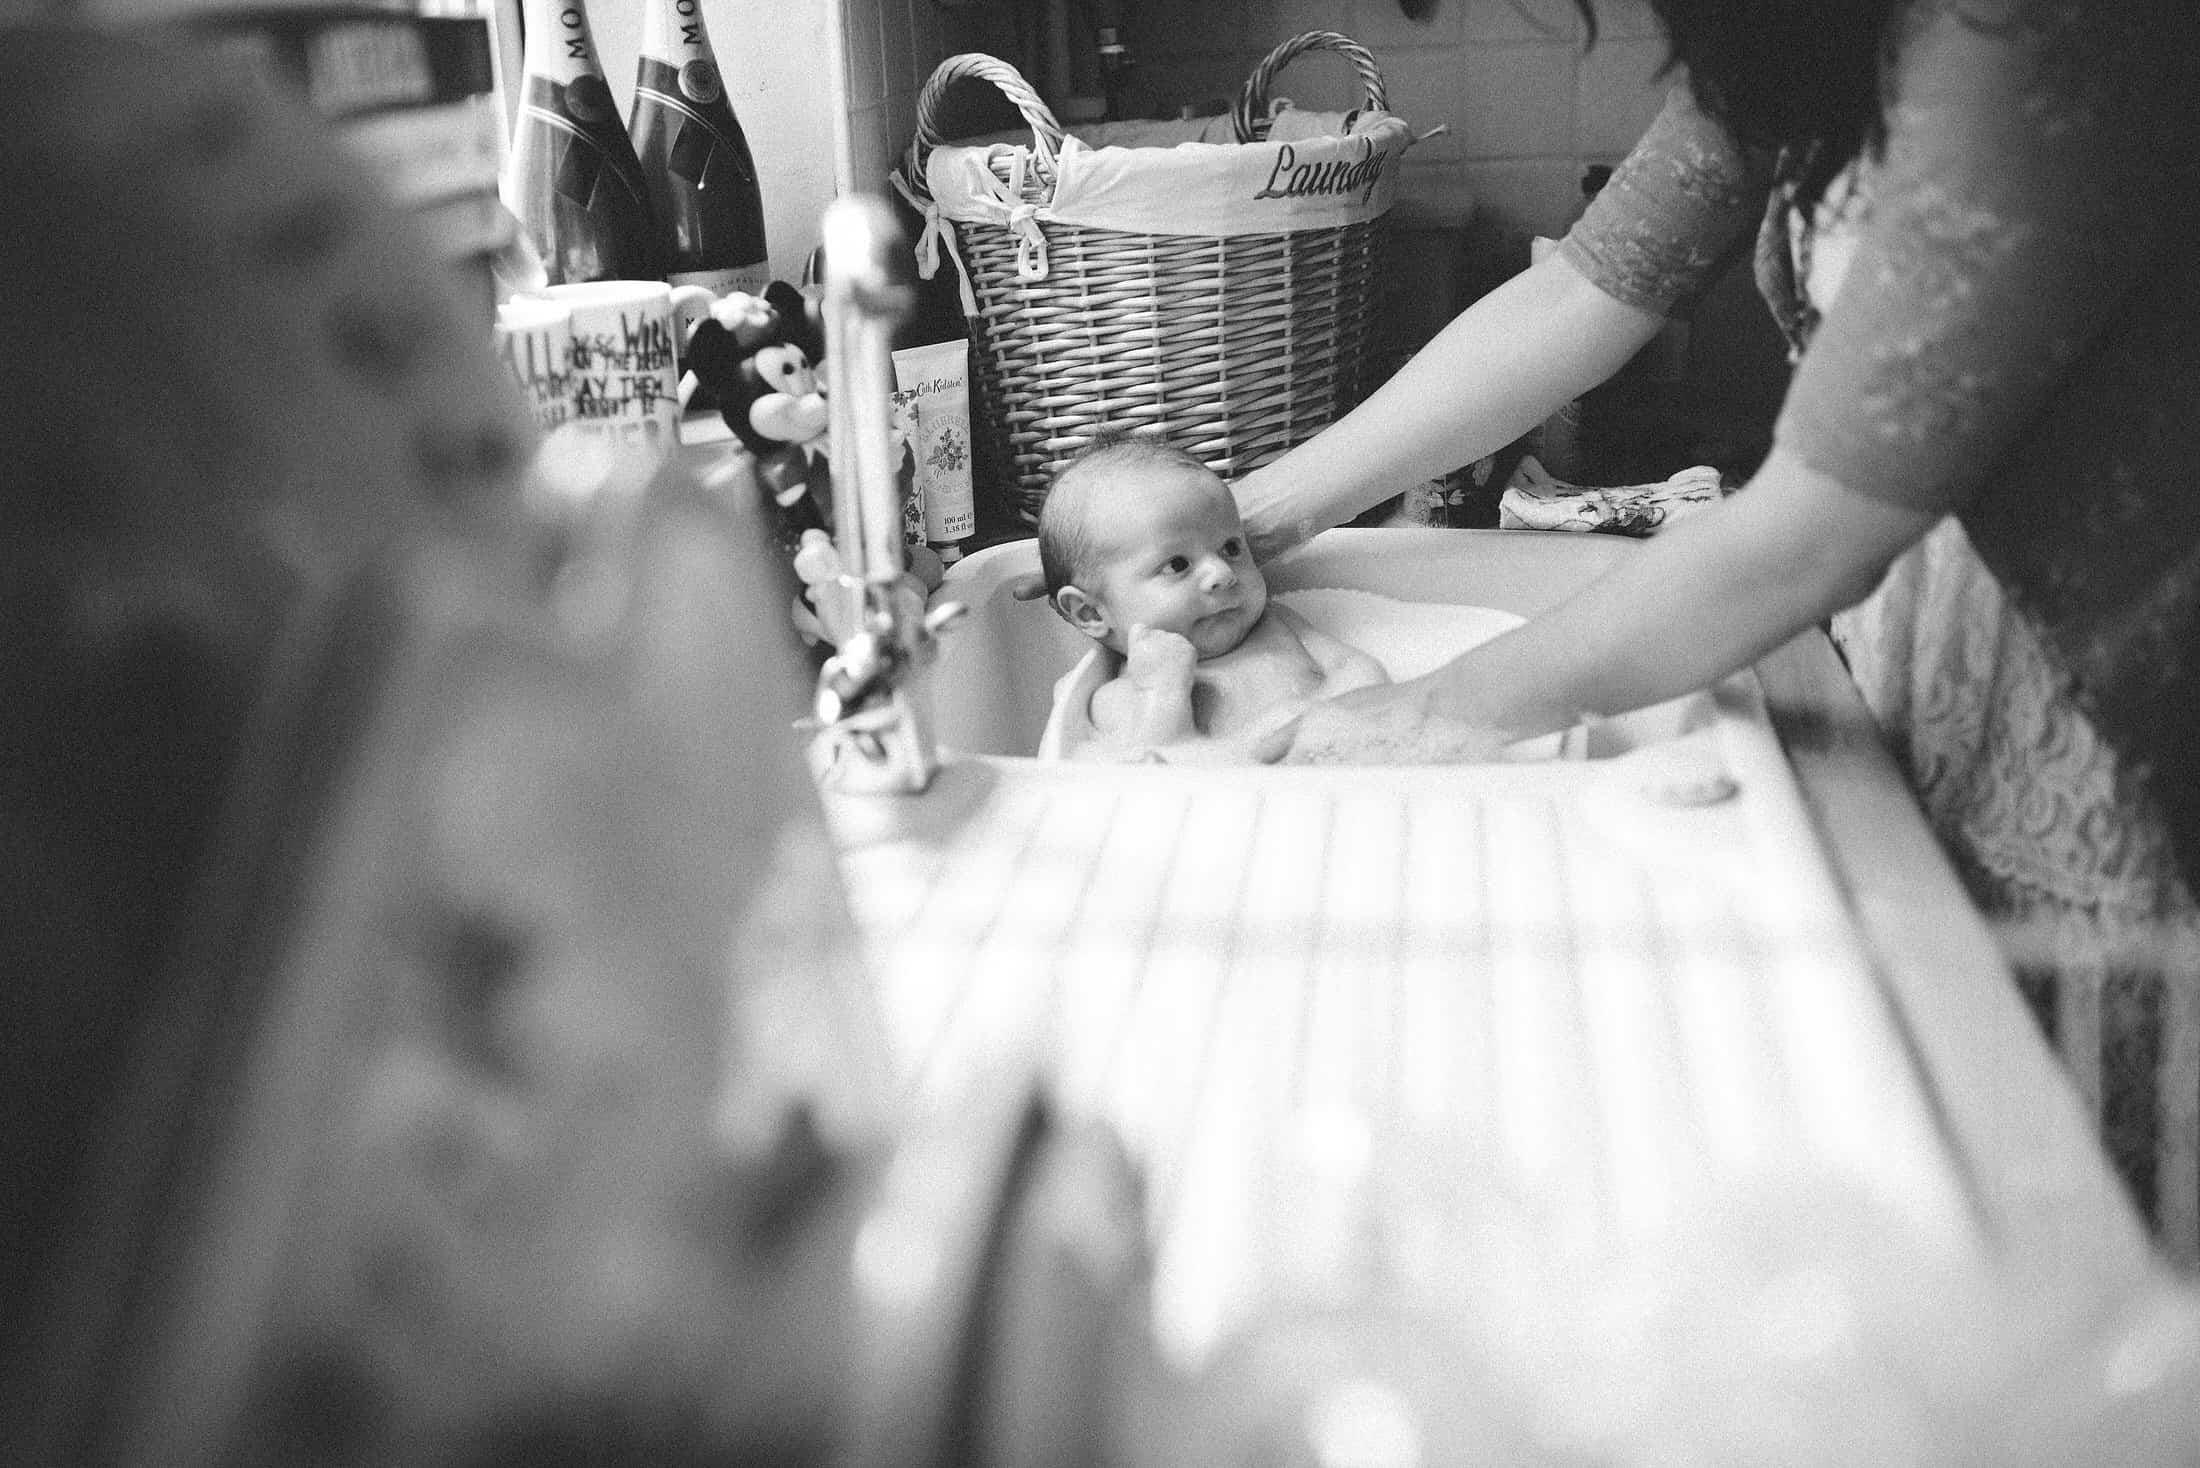 natural photos of babies and families